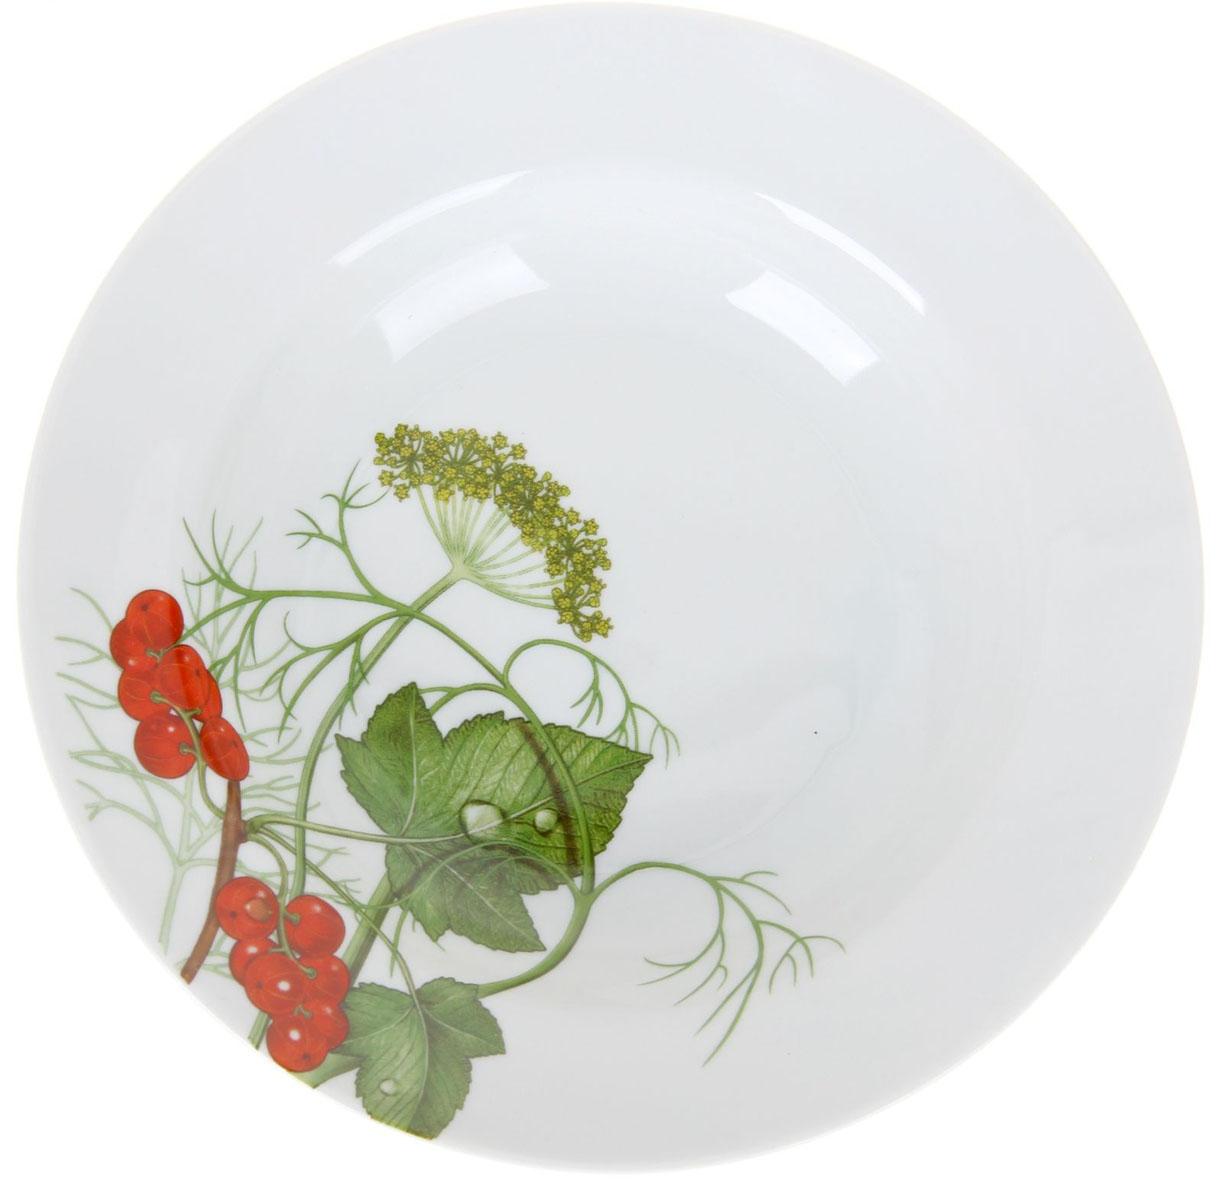 Тарелка глубокая Идиллия. Садочек, диаметр 20 см1224524